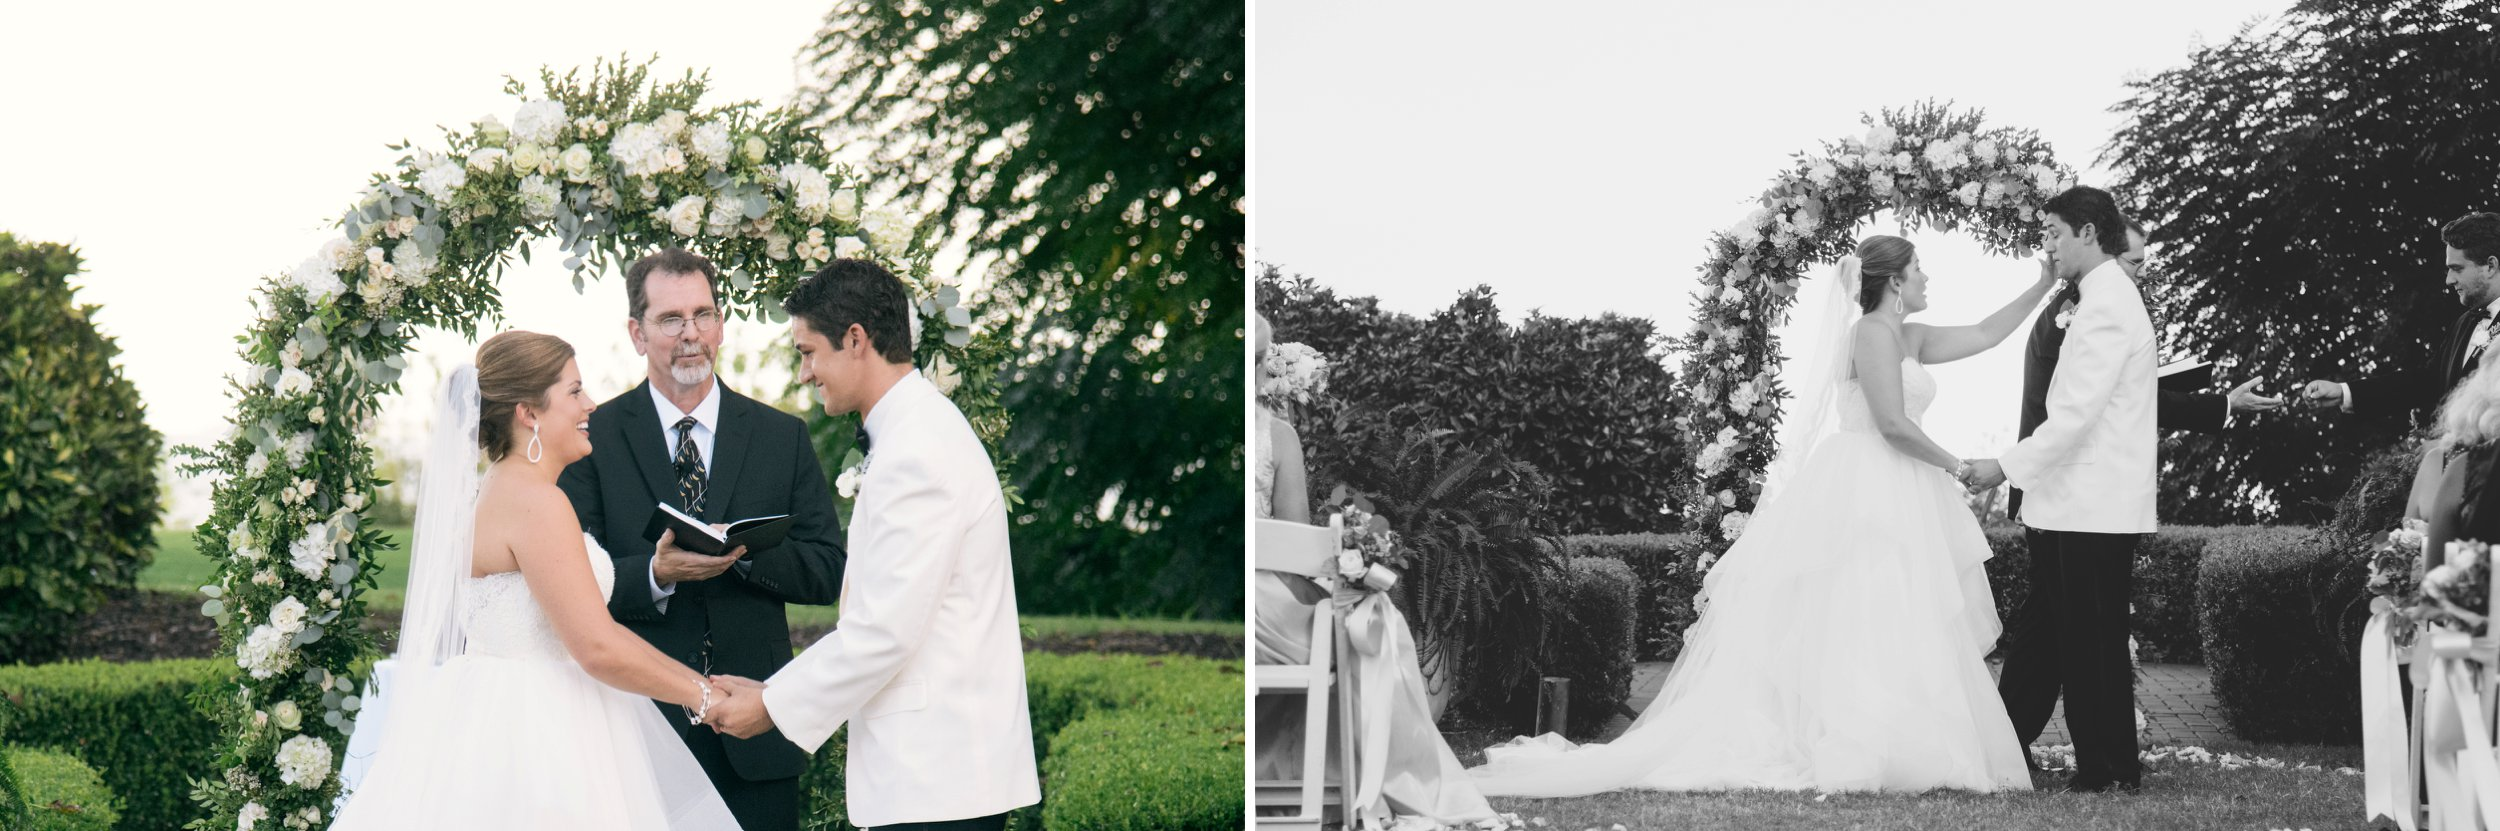 Charleston-wedding-photographer_0058.jpg